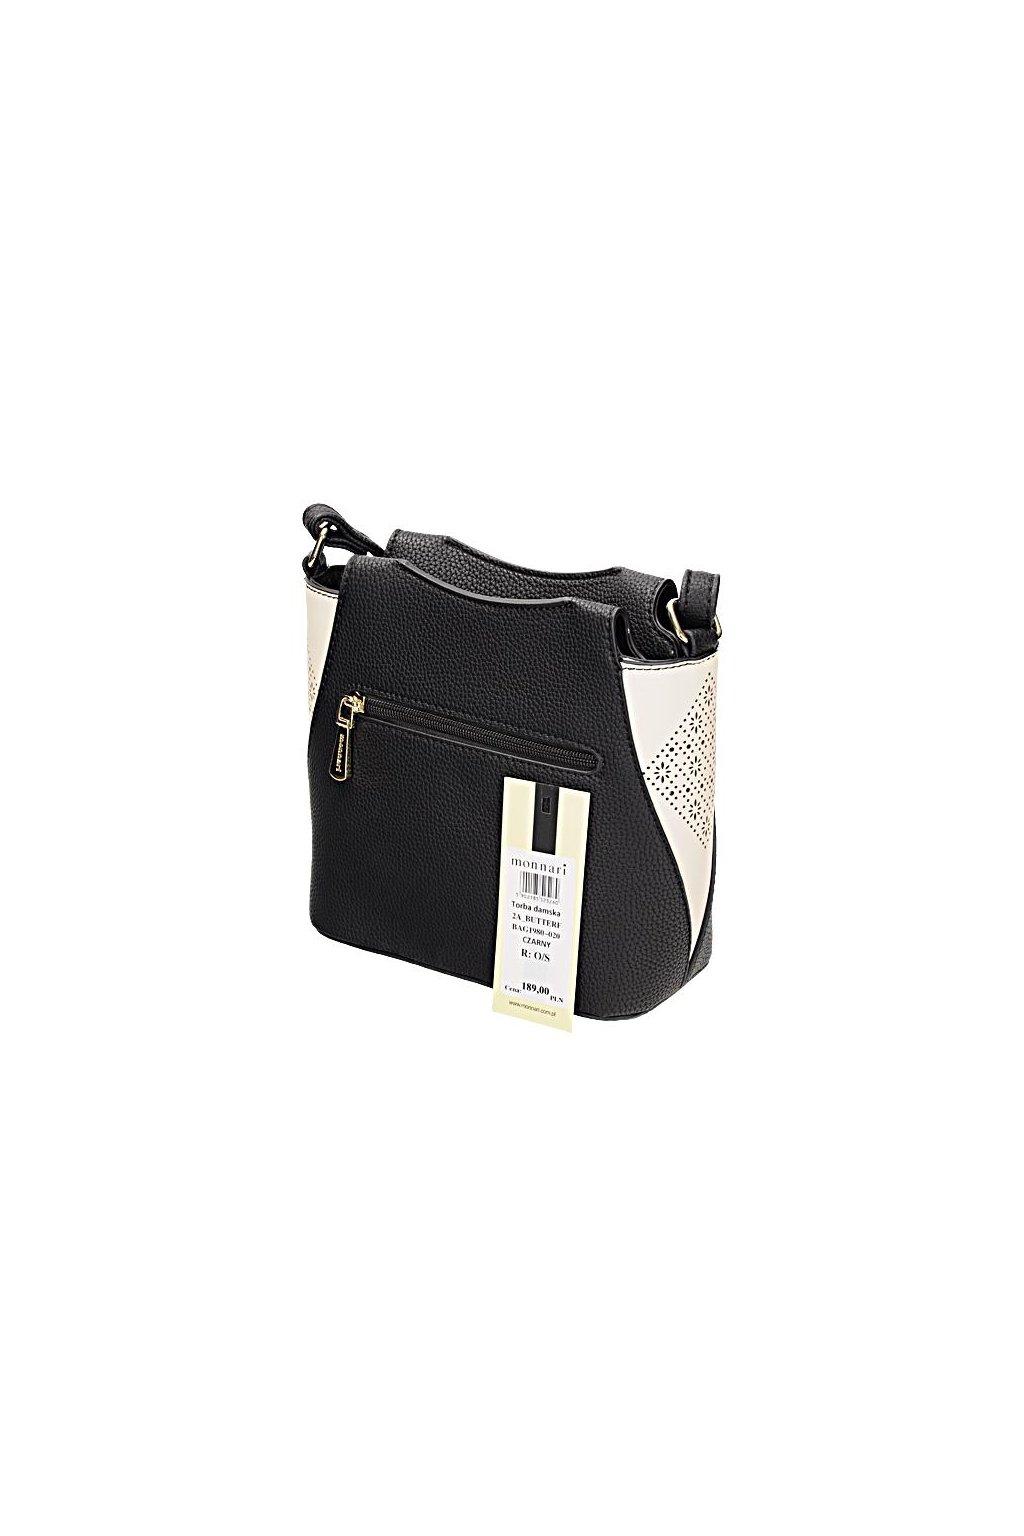 Čierna crossbody kabelka MONNARI BAG 1980-020 W18  33194187707